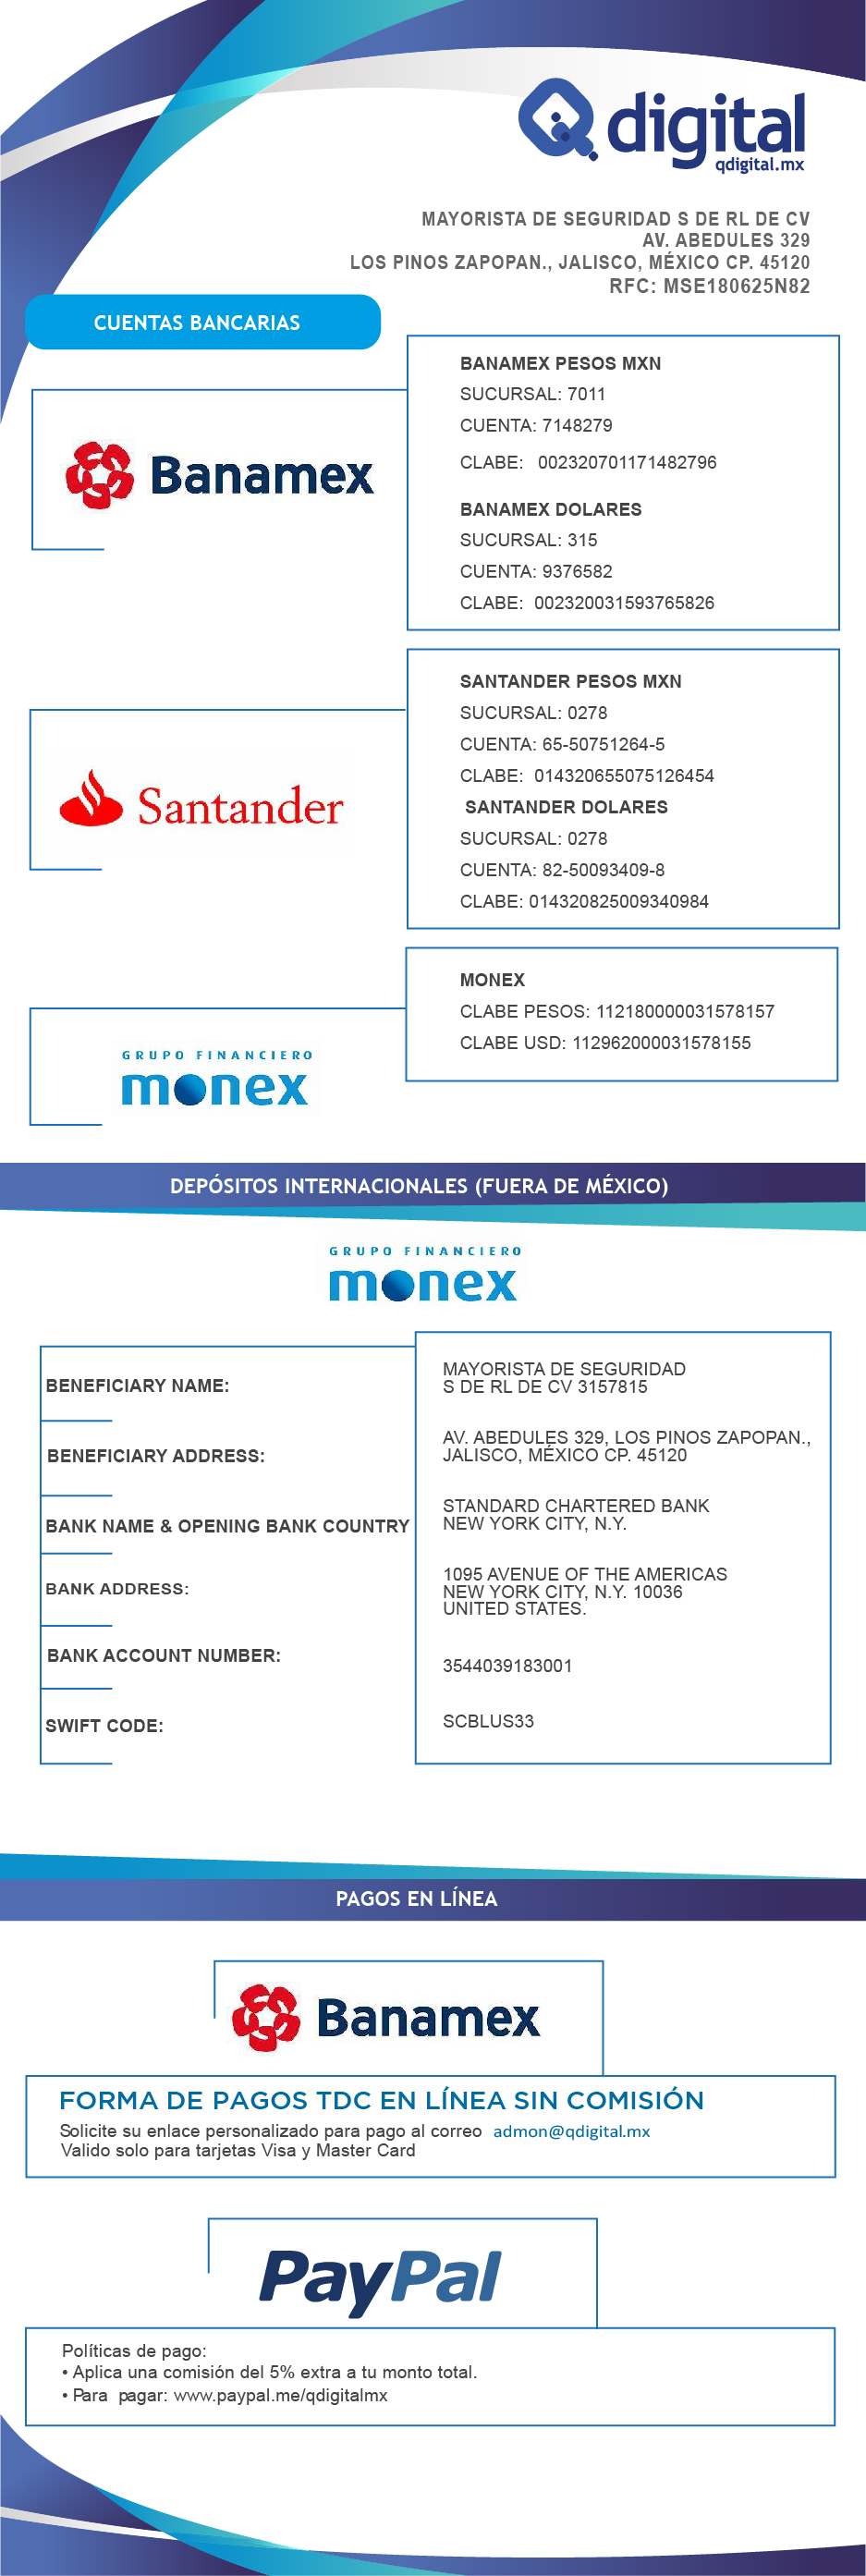 cuentas-bancarias.jpg